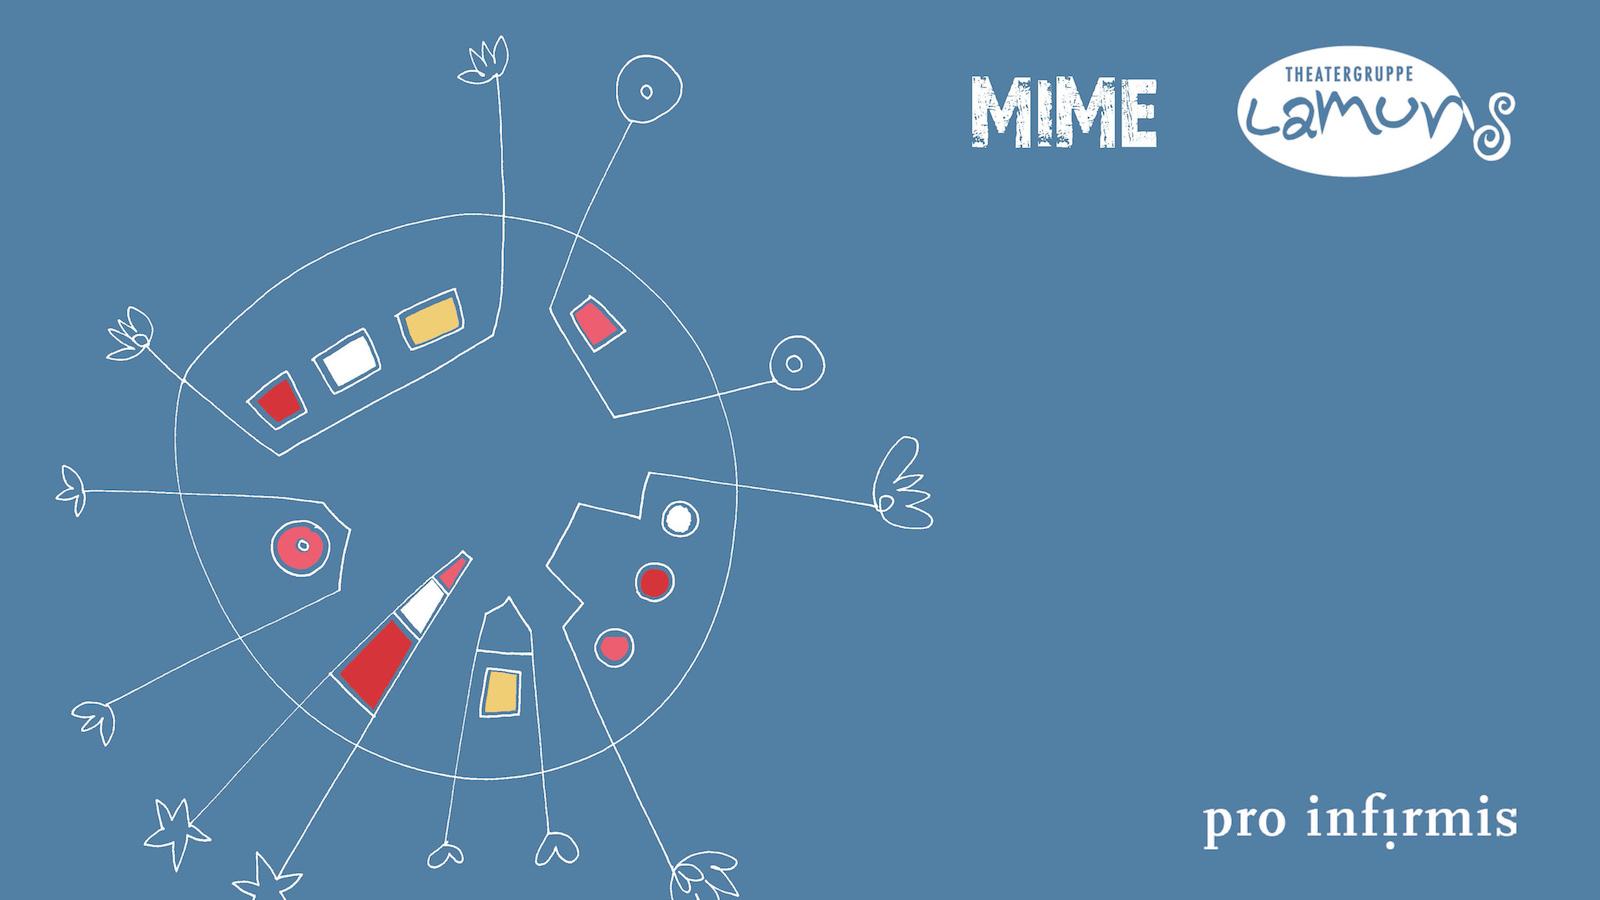 improtheater-chur_mime